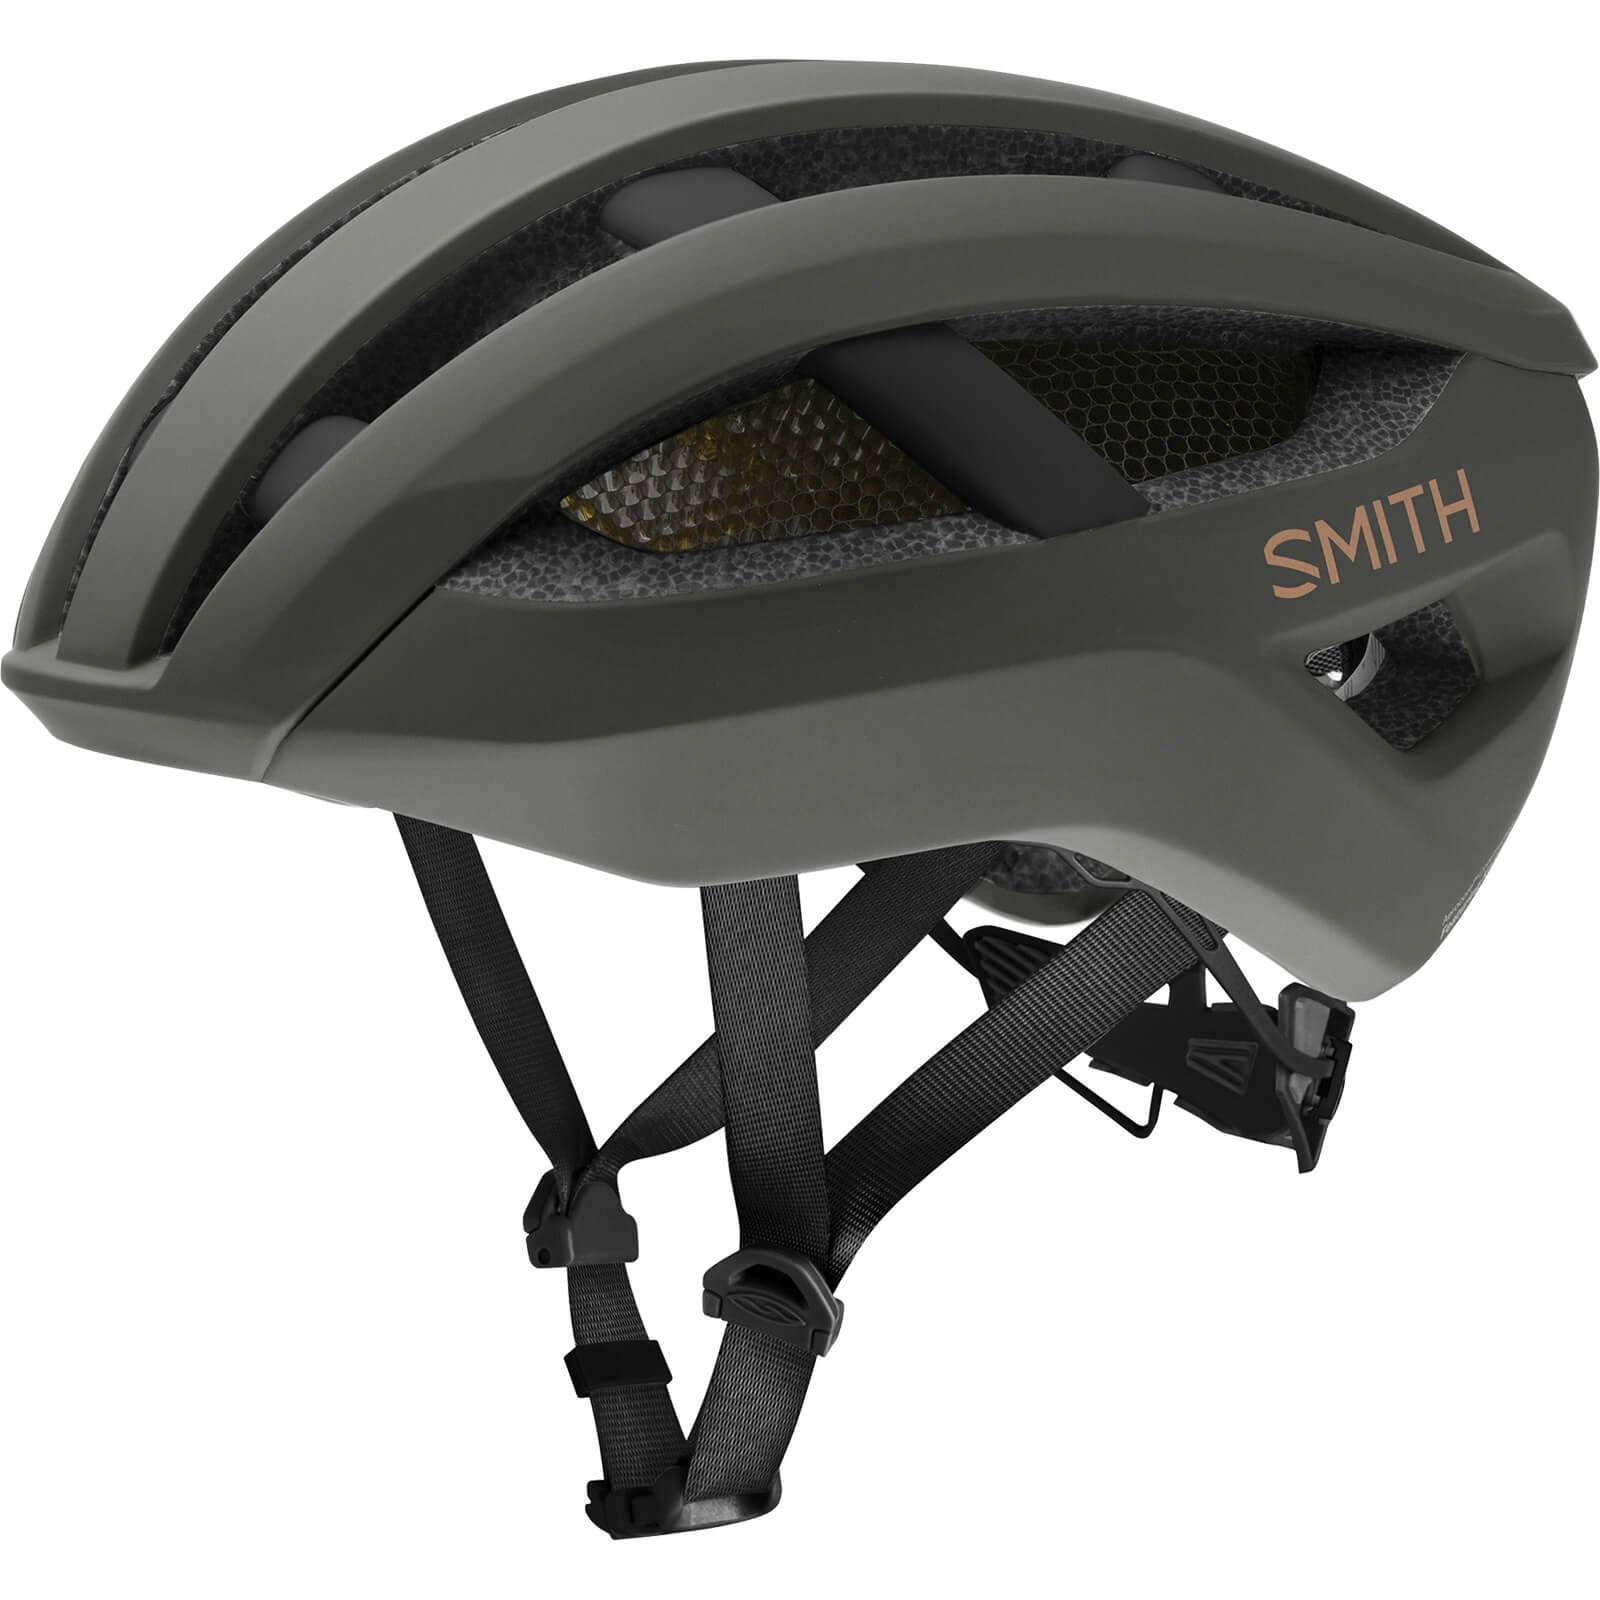 Smith Network MIPS Road Helmet - Medium - Brown; unisex